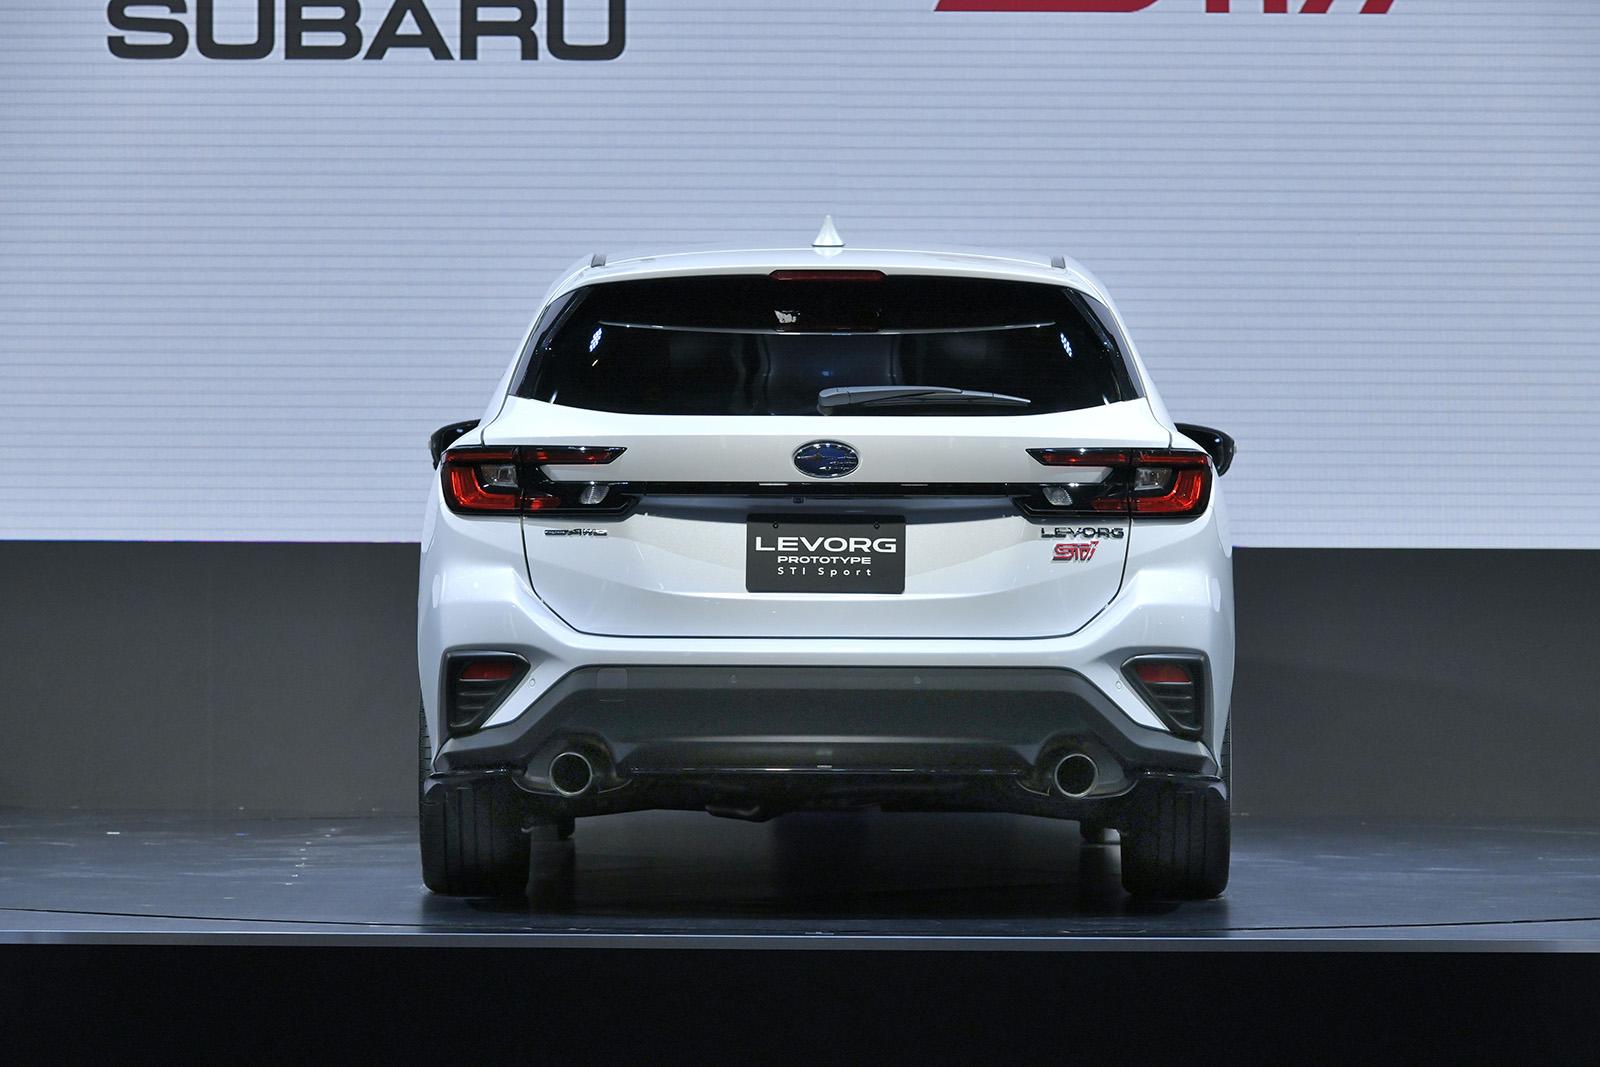 Subaru-Levorg-STI-Sport-Prototype-4